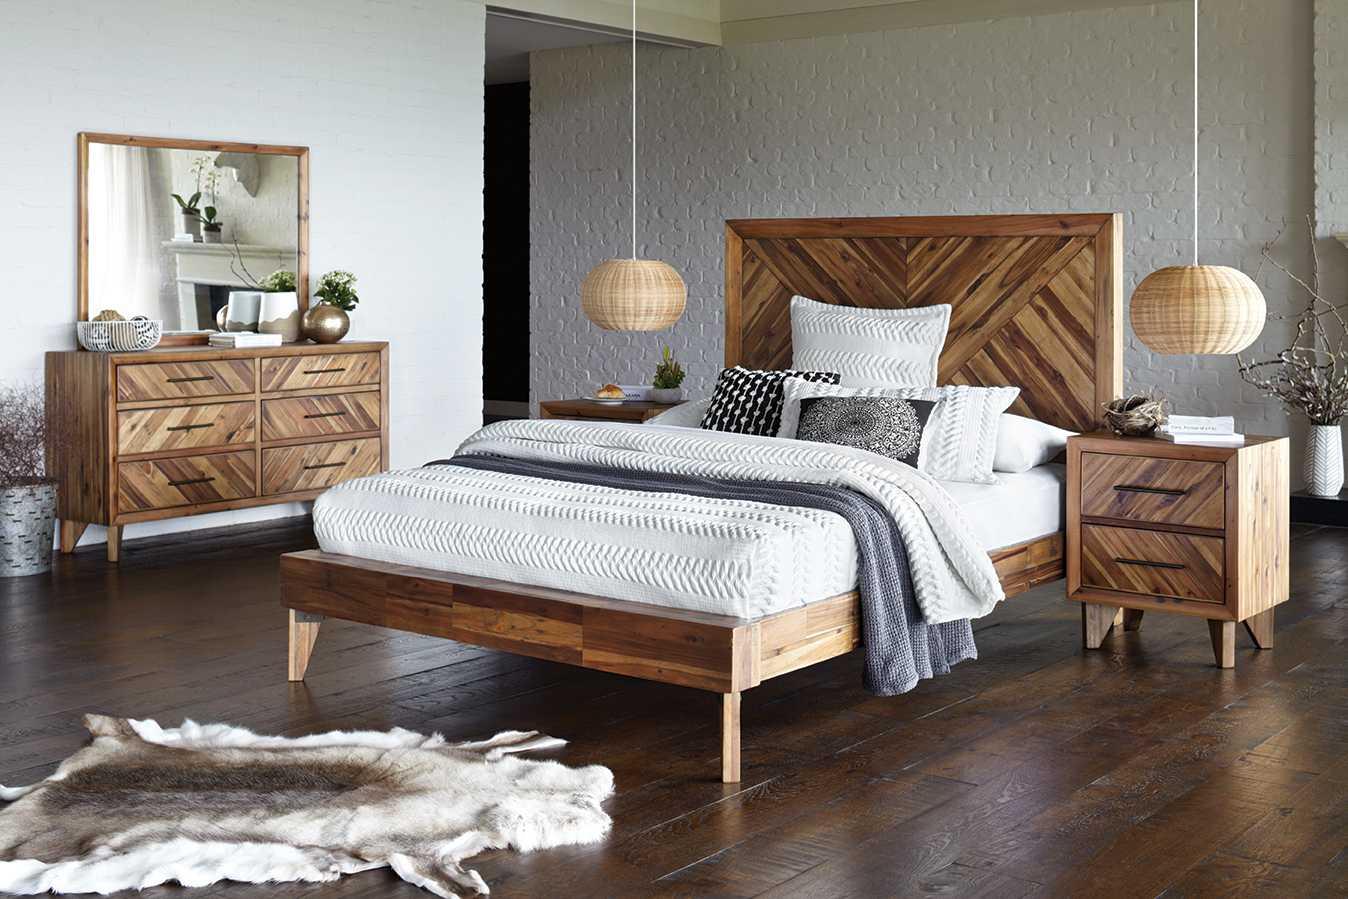 Davinci furniture perancis furniture standing clock mirror contact us - Bedroom Furniture In Bedding Harvey Norman